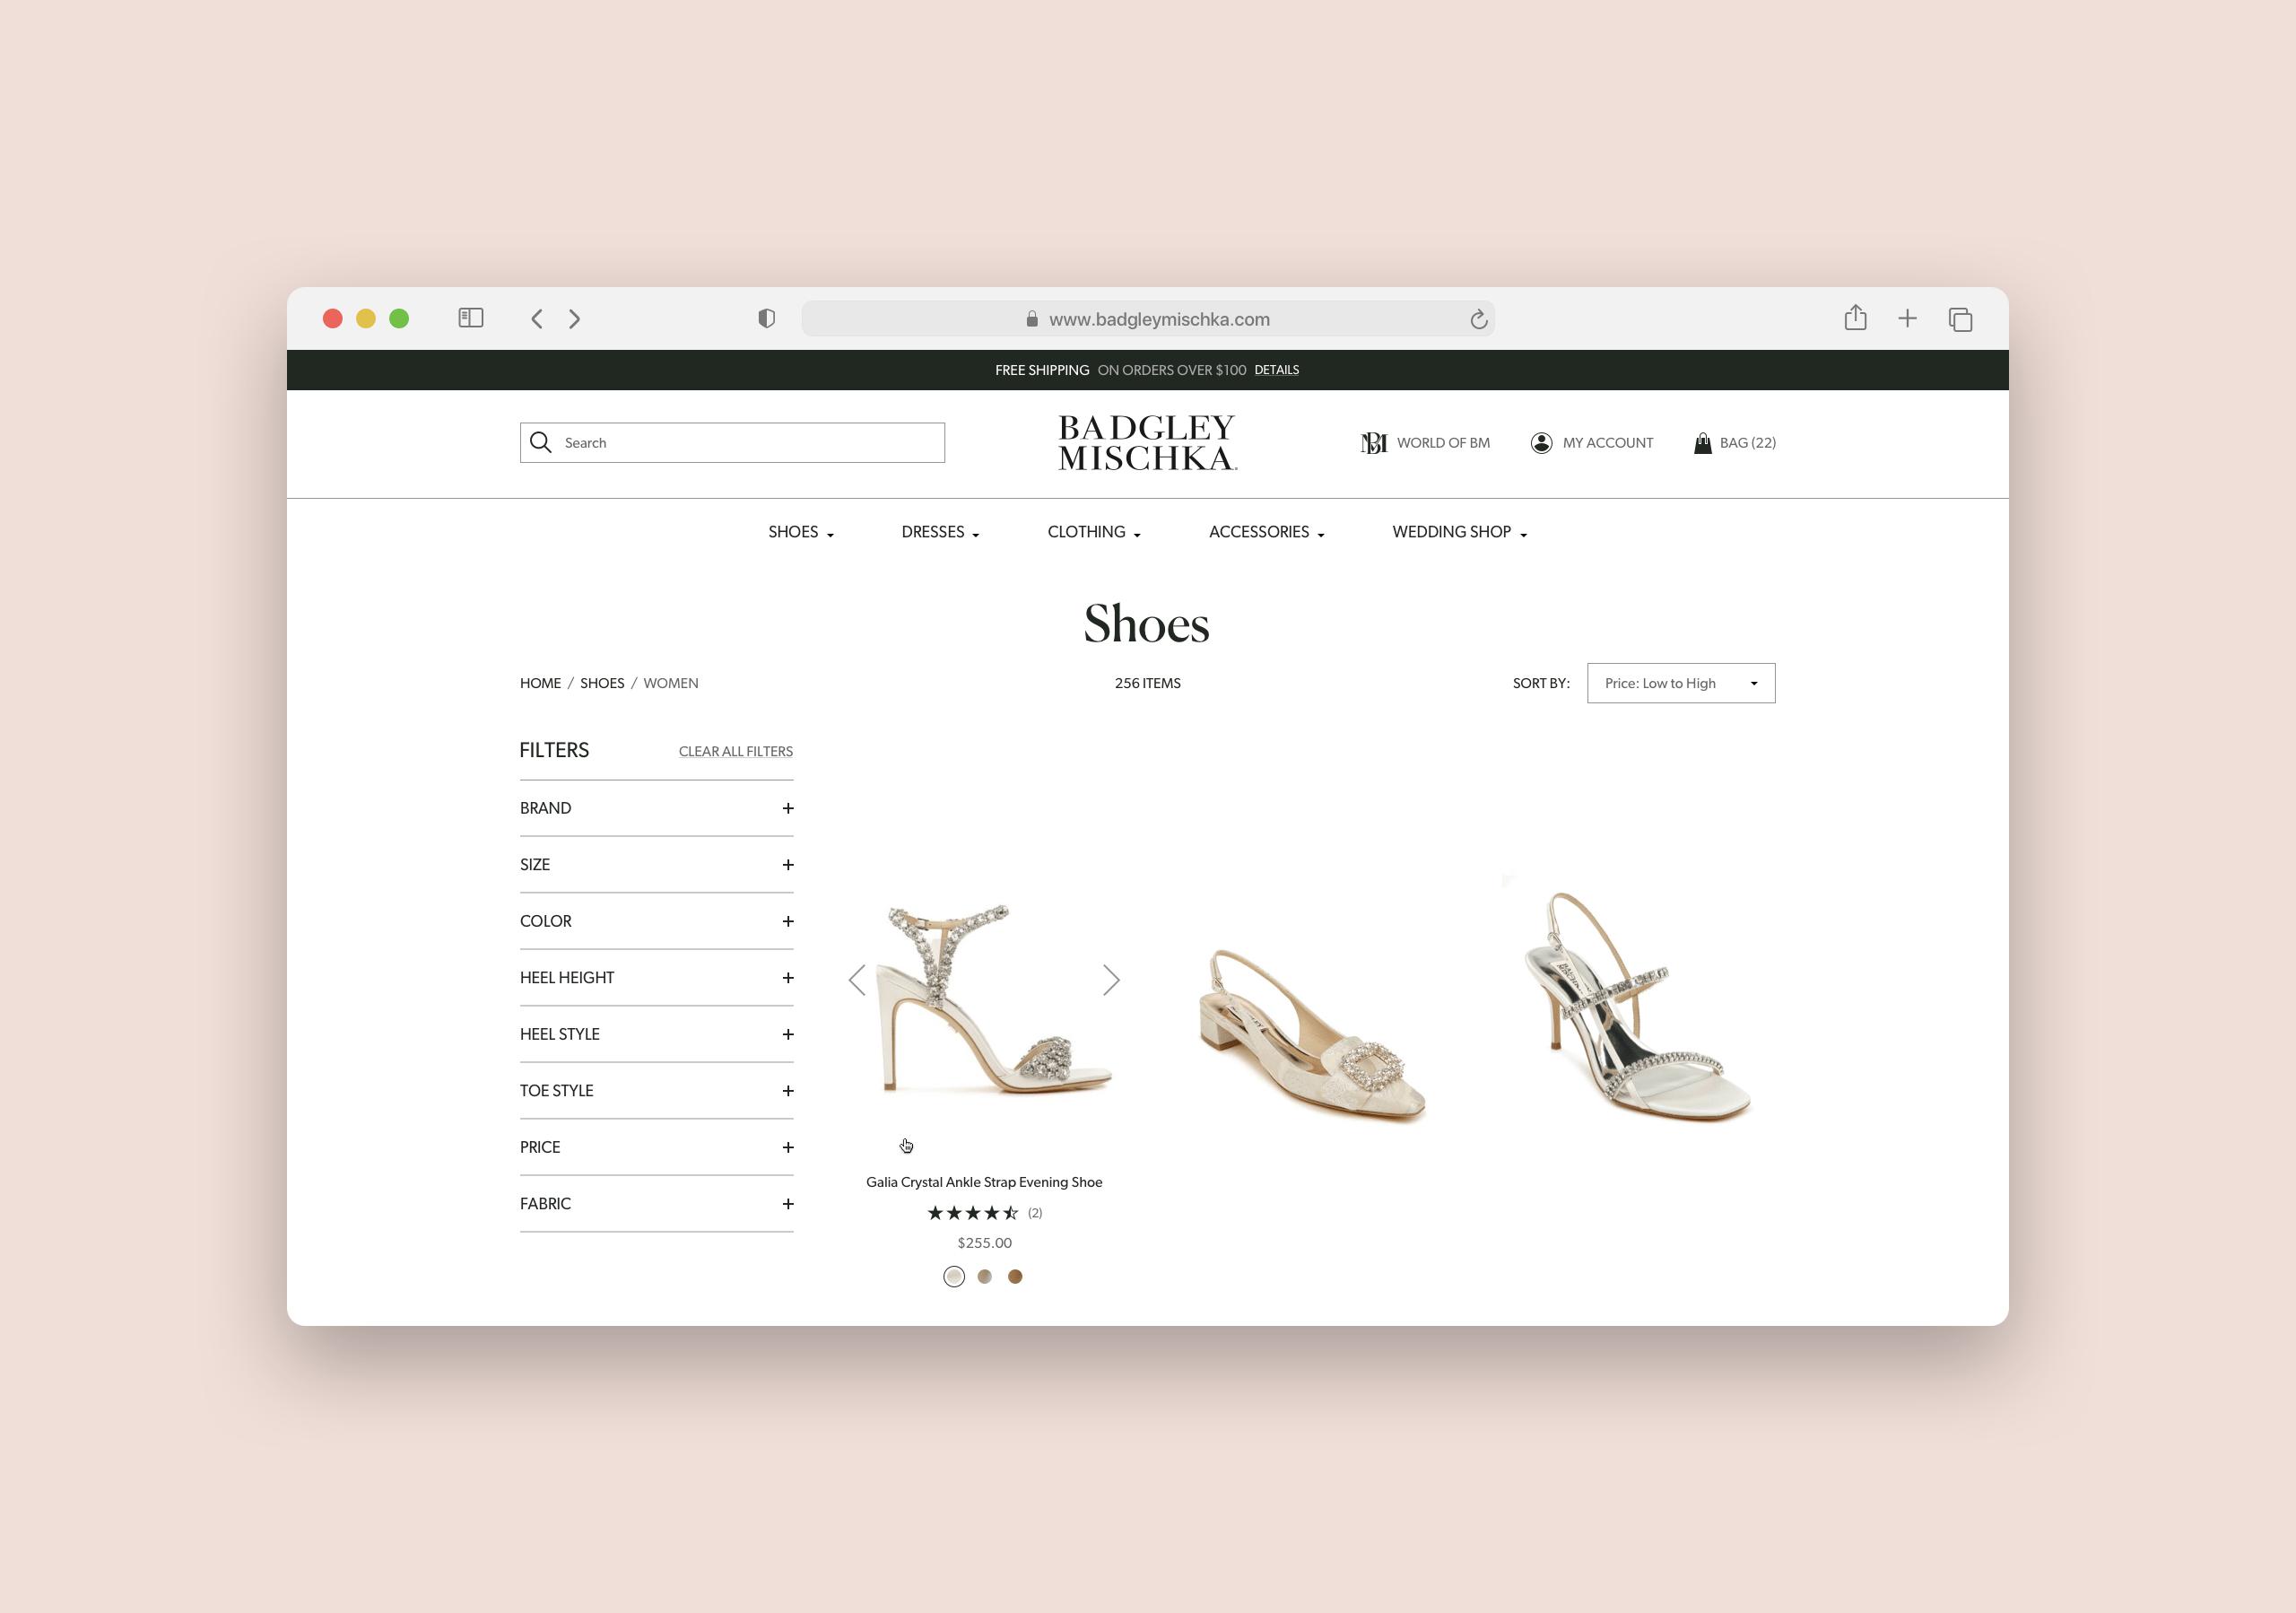 Badgley Mischka Product Listing Zoom